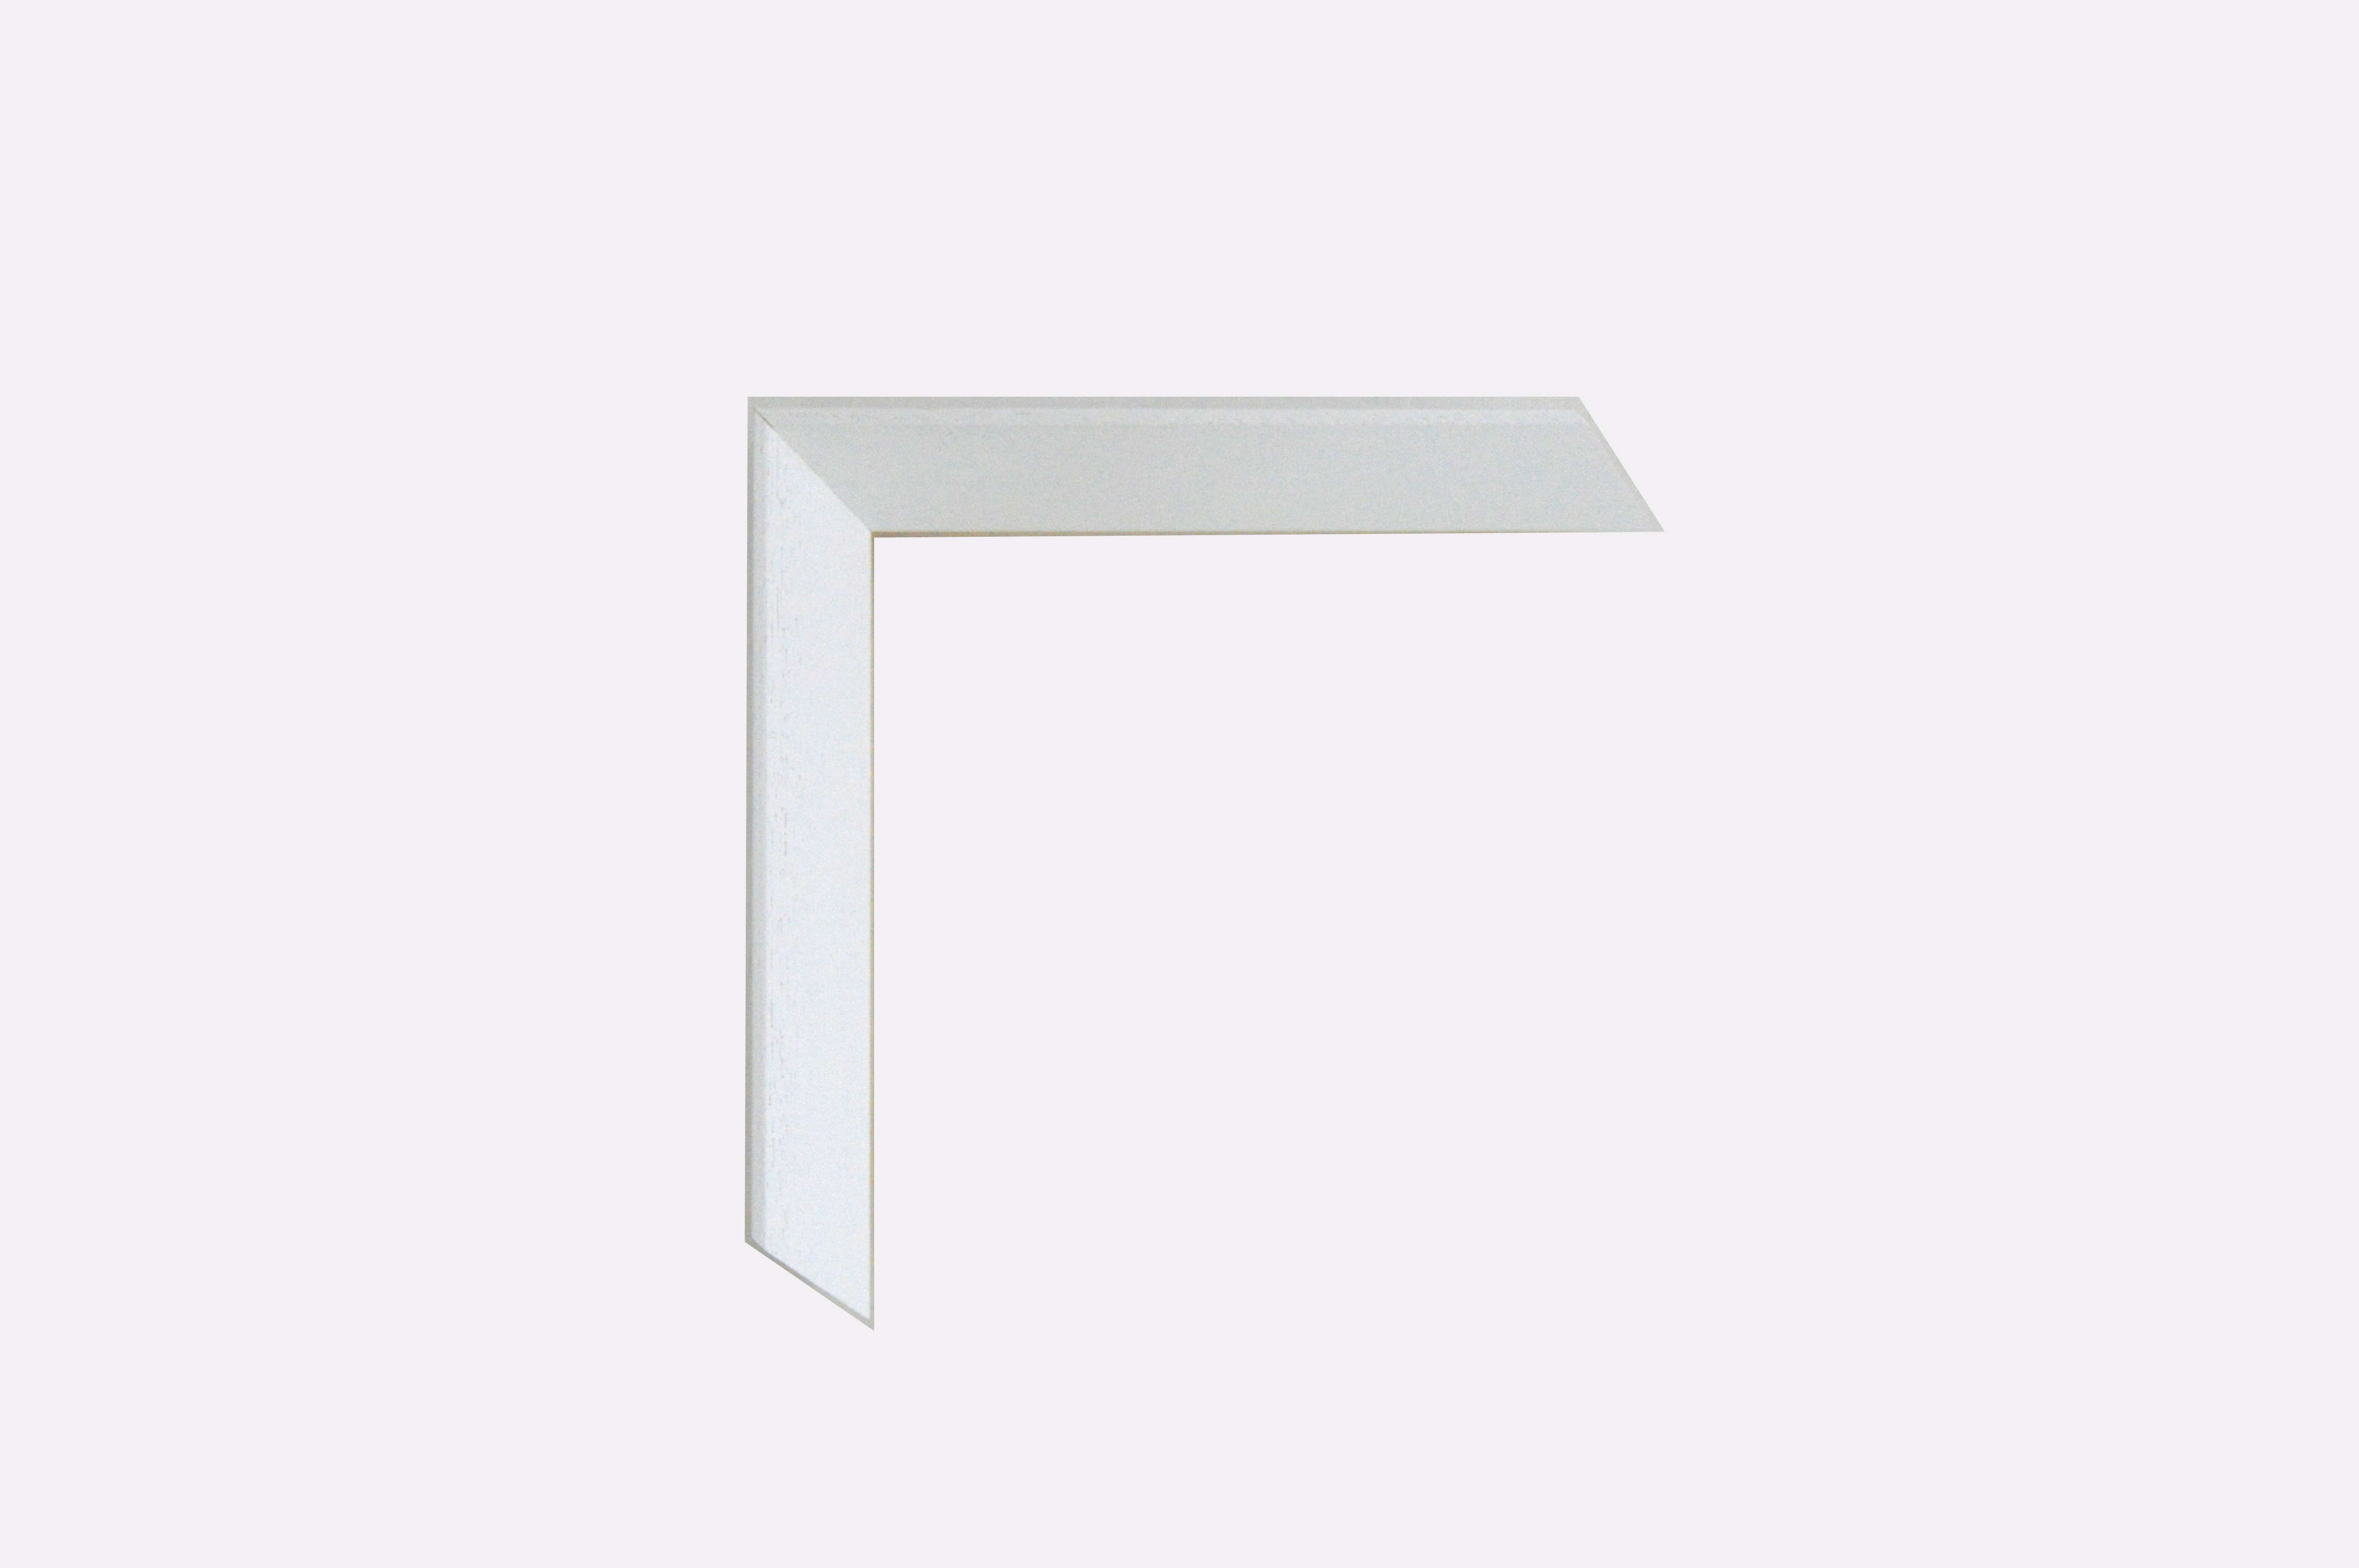 01112-380-BISEL BLANCA-ancho2cm